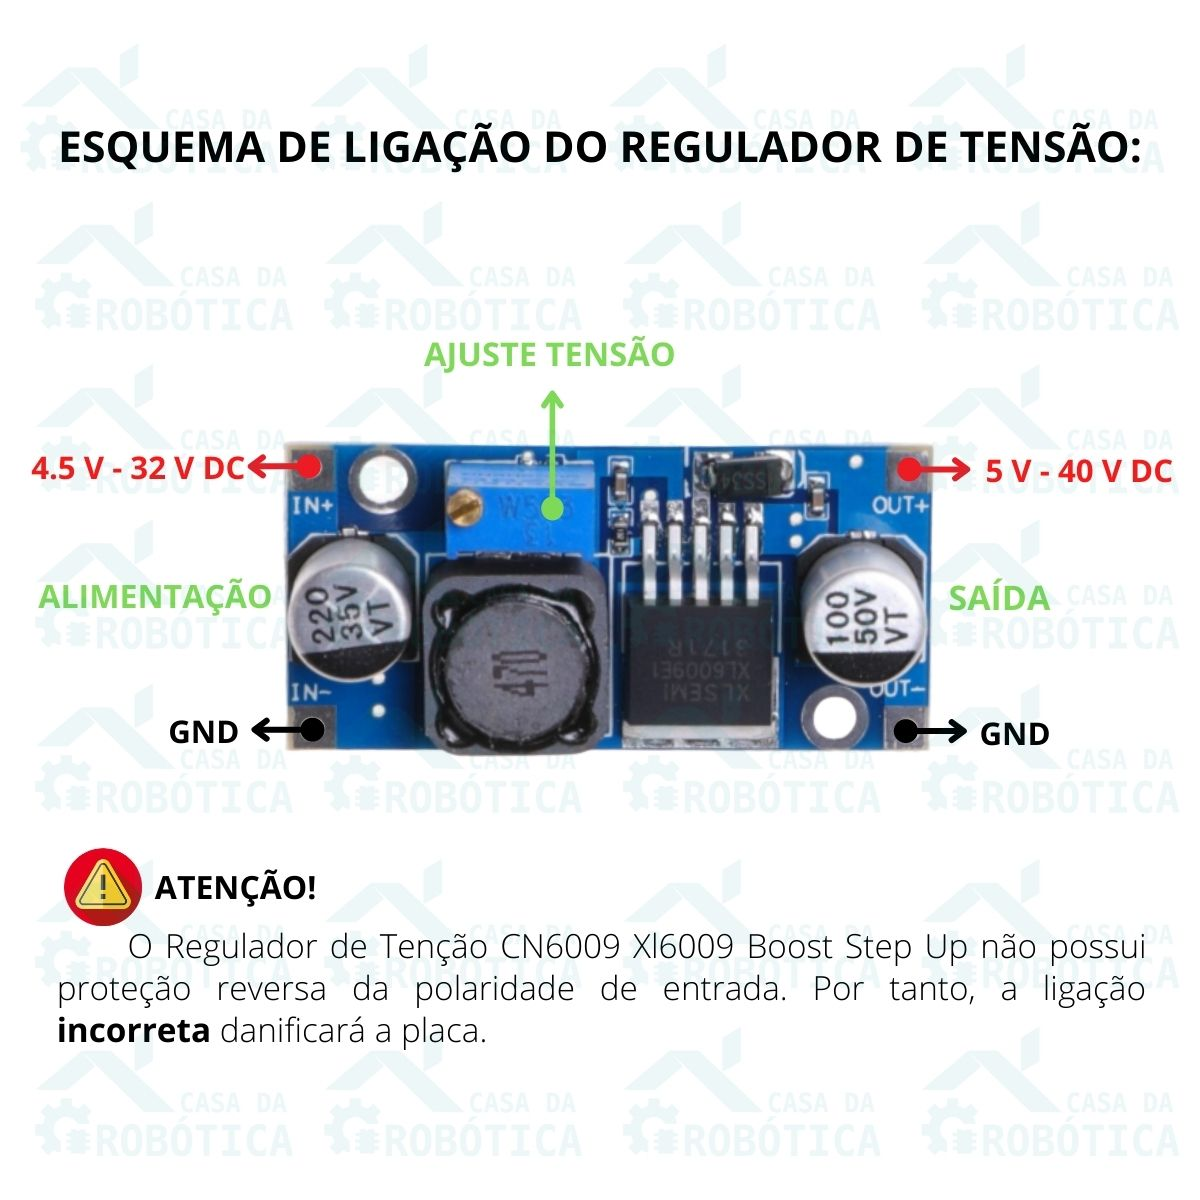 10x Conversor Regulador de Tensão DC DC Cn6009 Xl6009 Boost Step Up